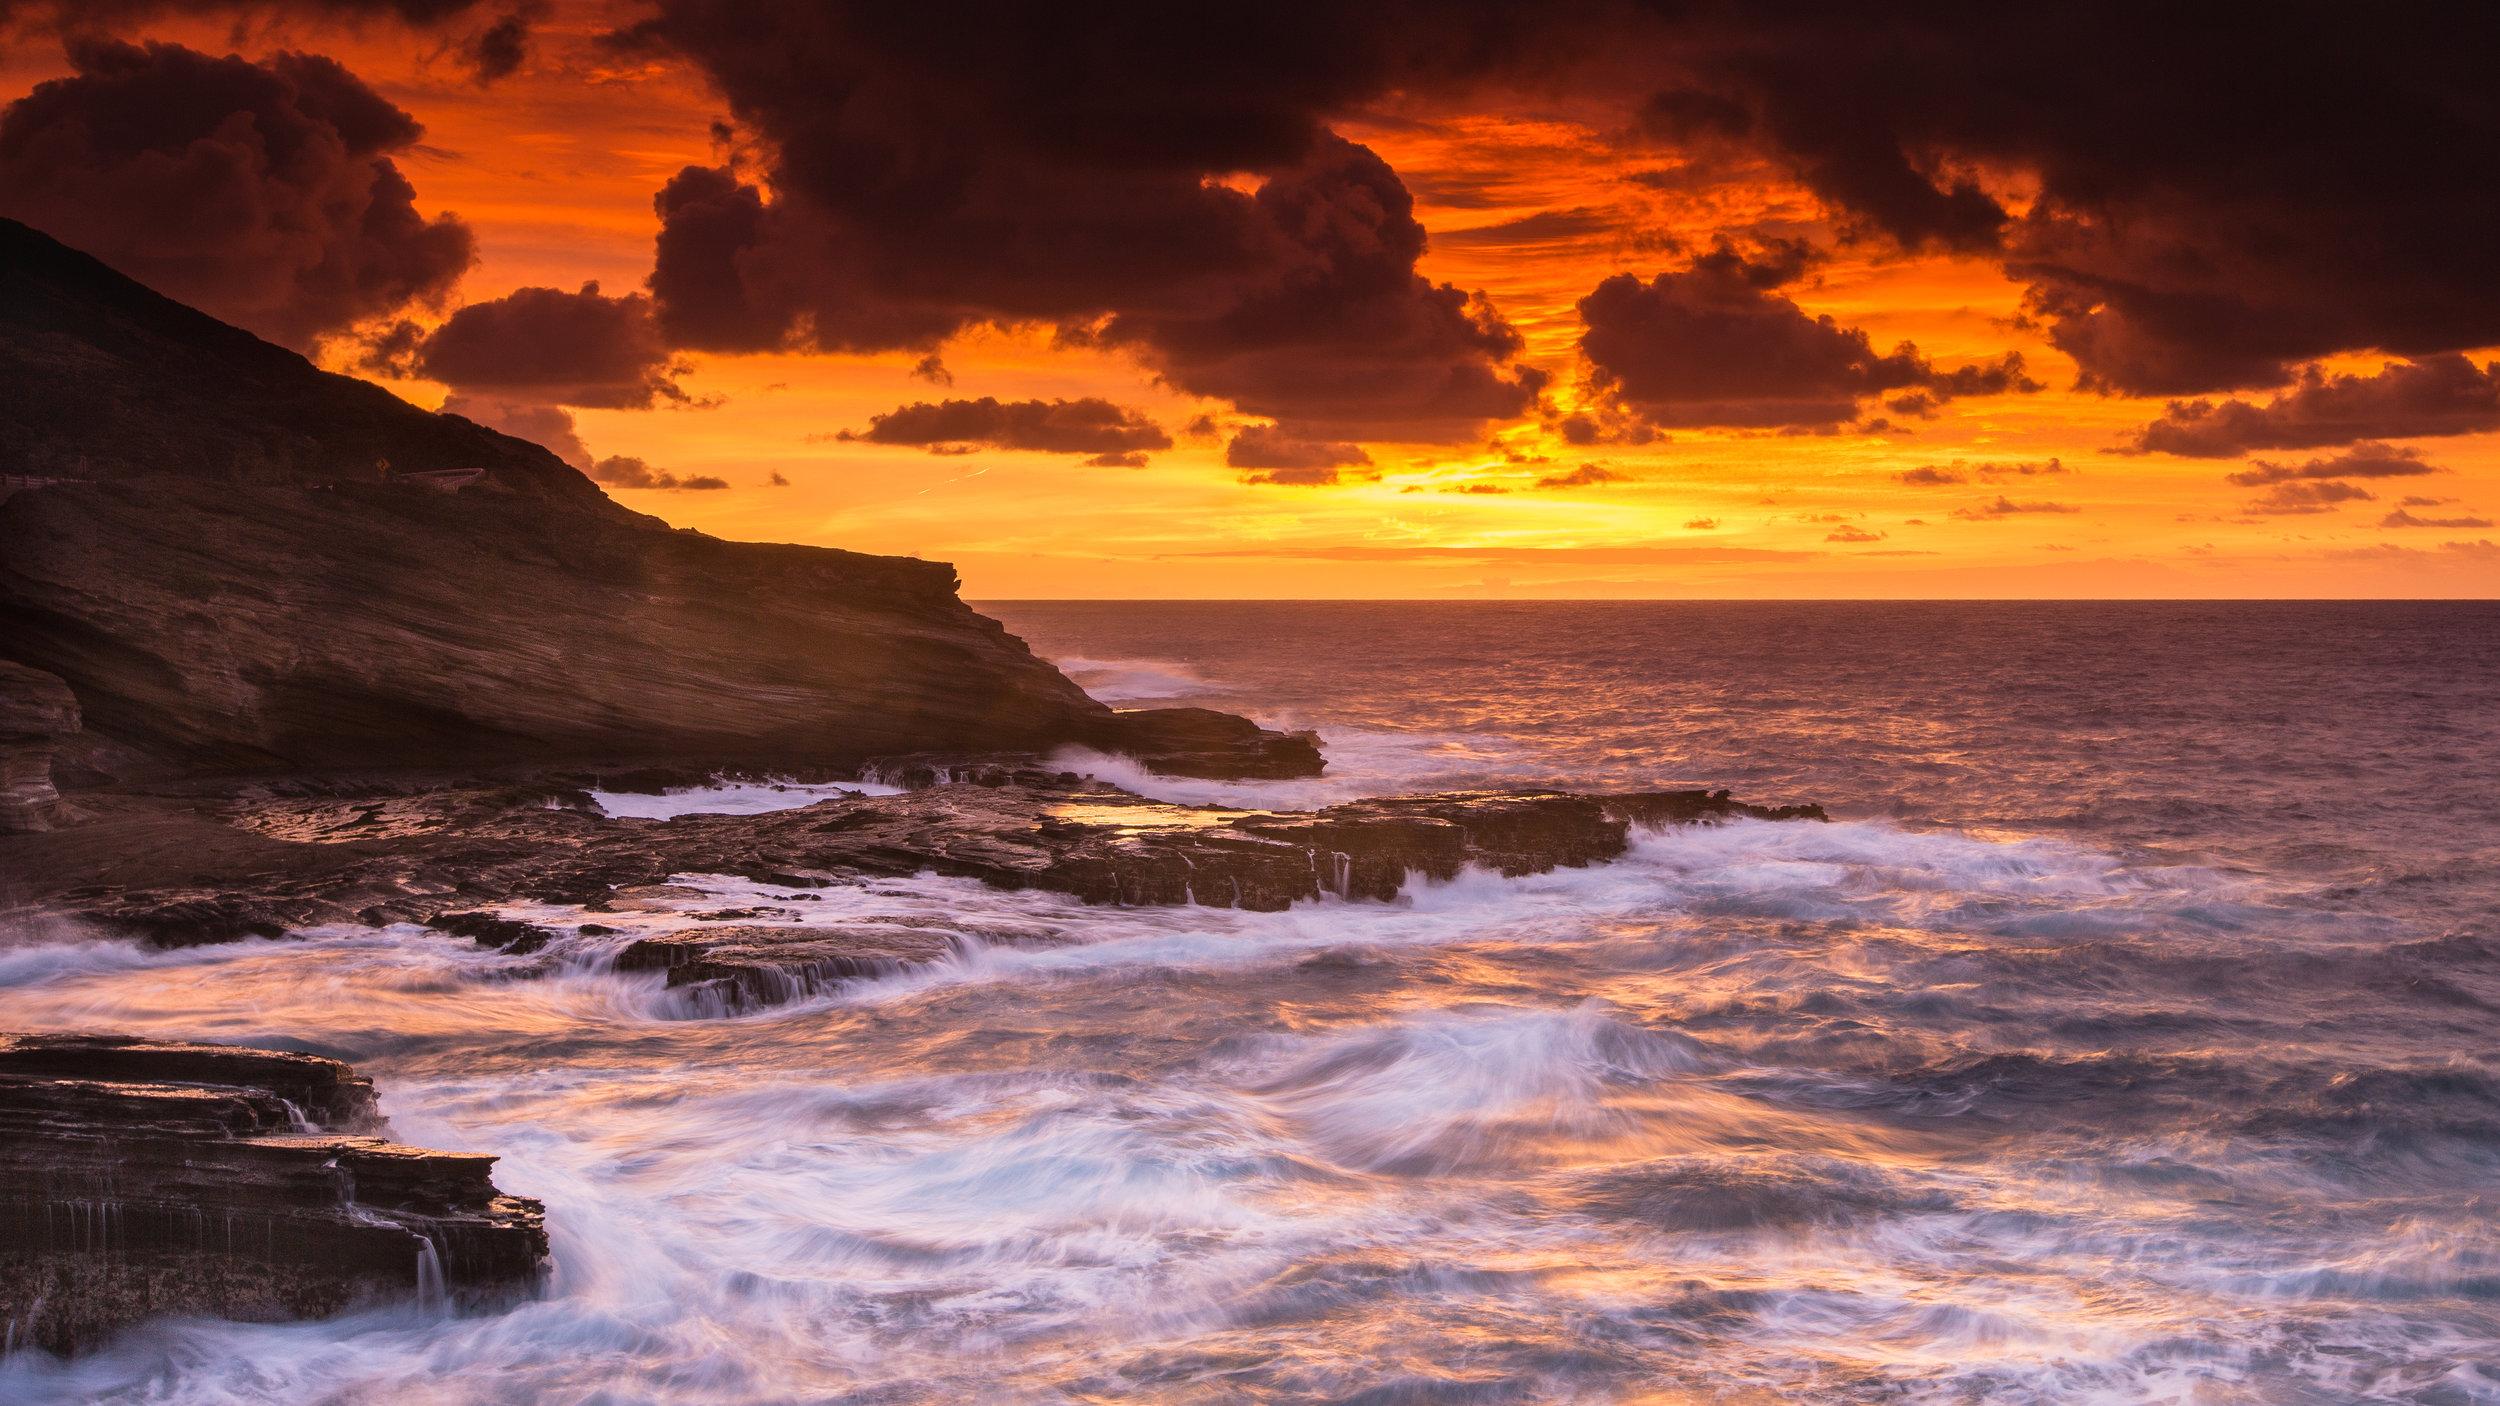 Oahu Lanai Lookout sunrise waves ominous